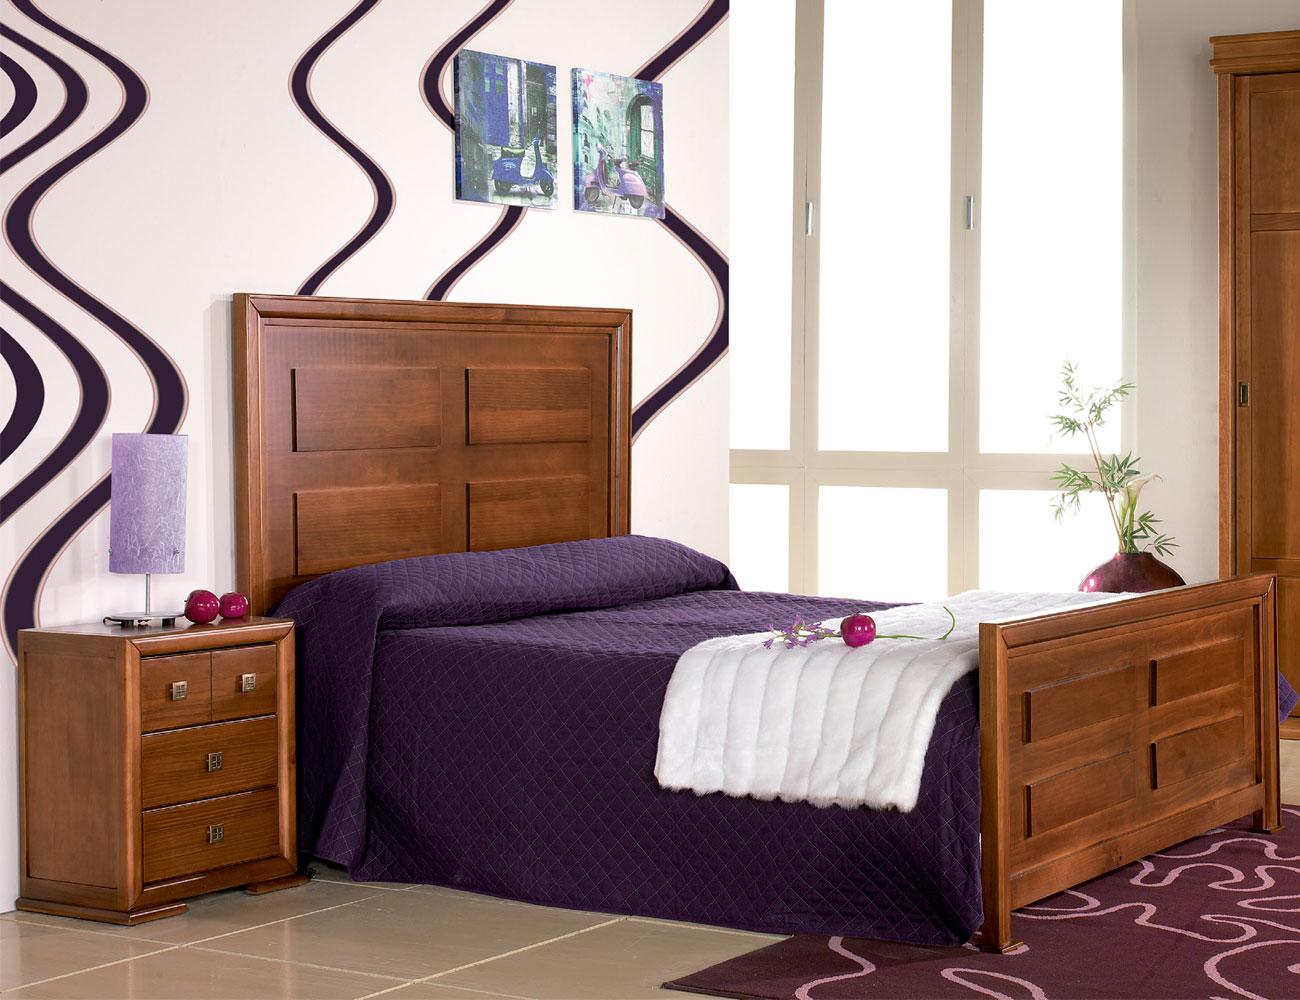 Composicion02 dormitorio matrimonio cama sevilla 2